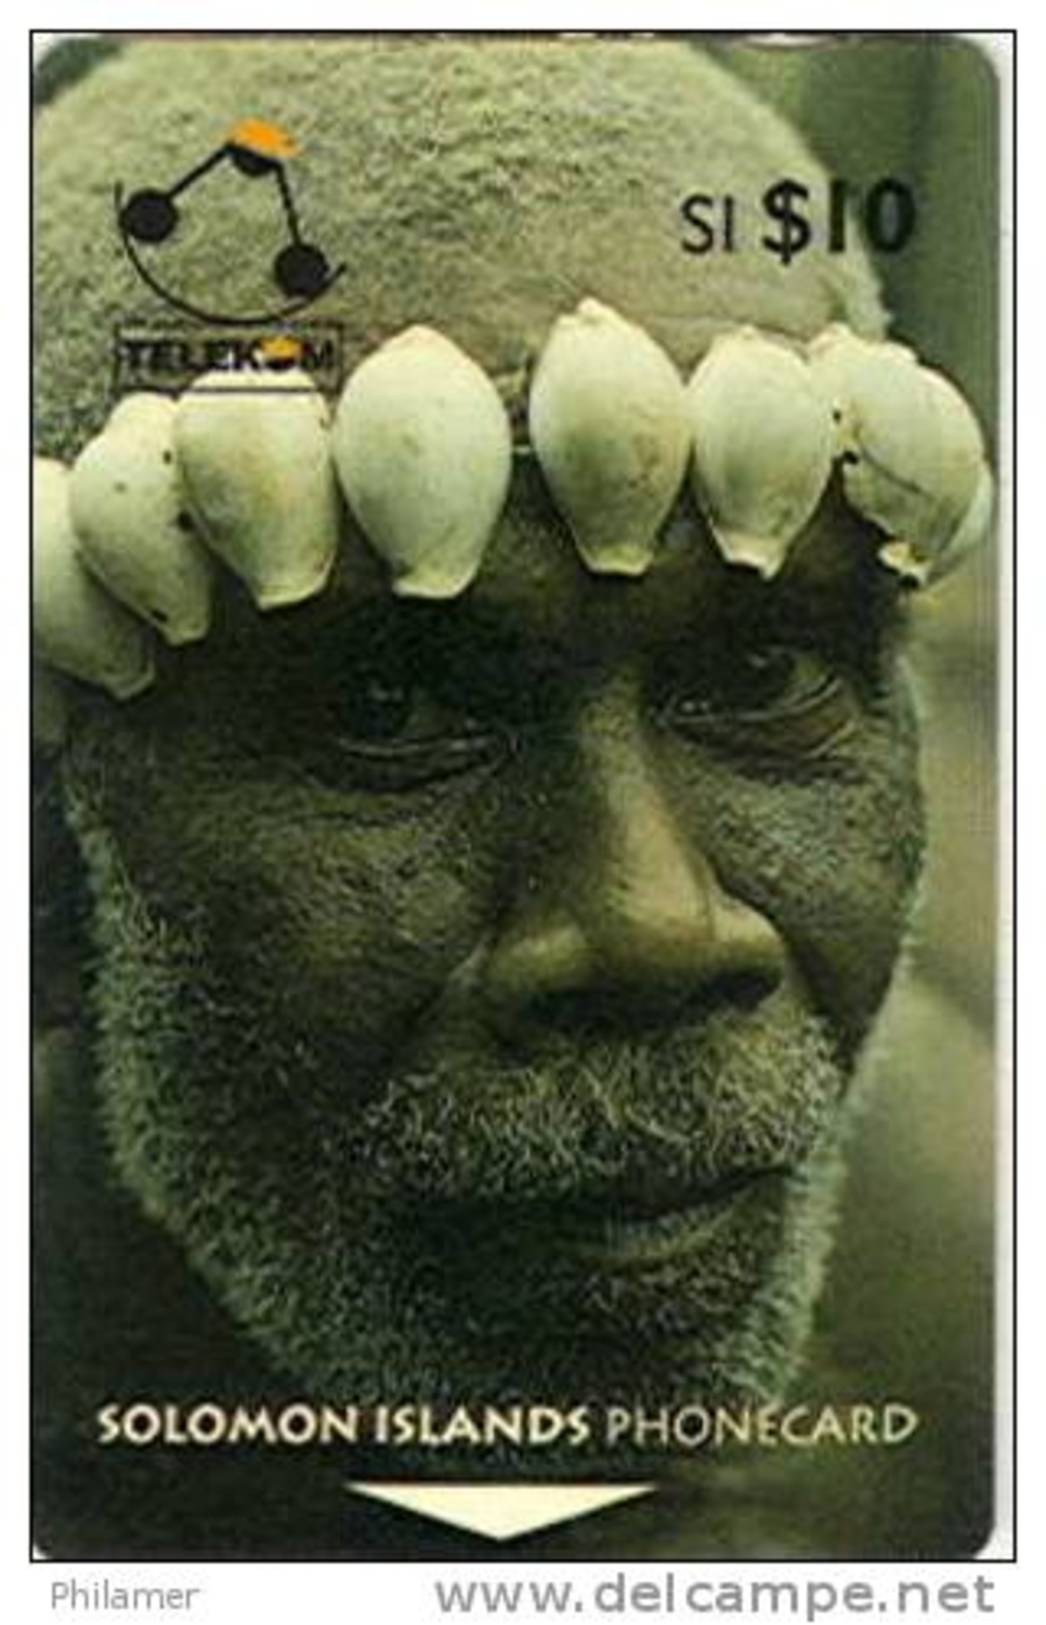 Salomon Solomon Telecarte Phonecard 10 Dollars Visage Pere SANS B Ut TBE - Isole Salomon